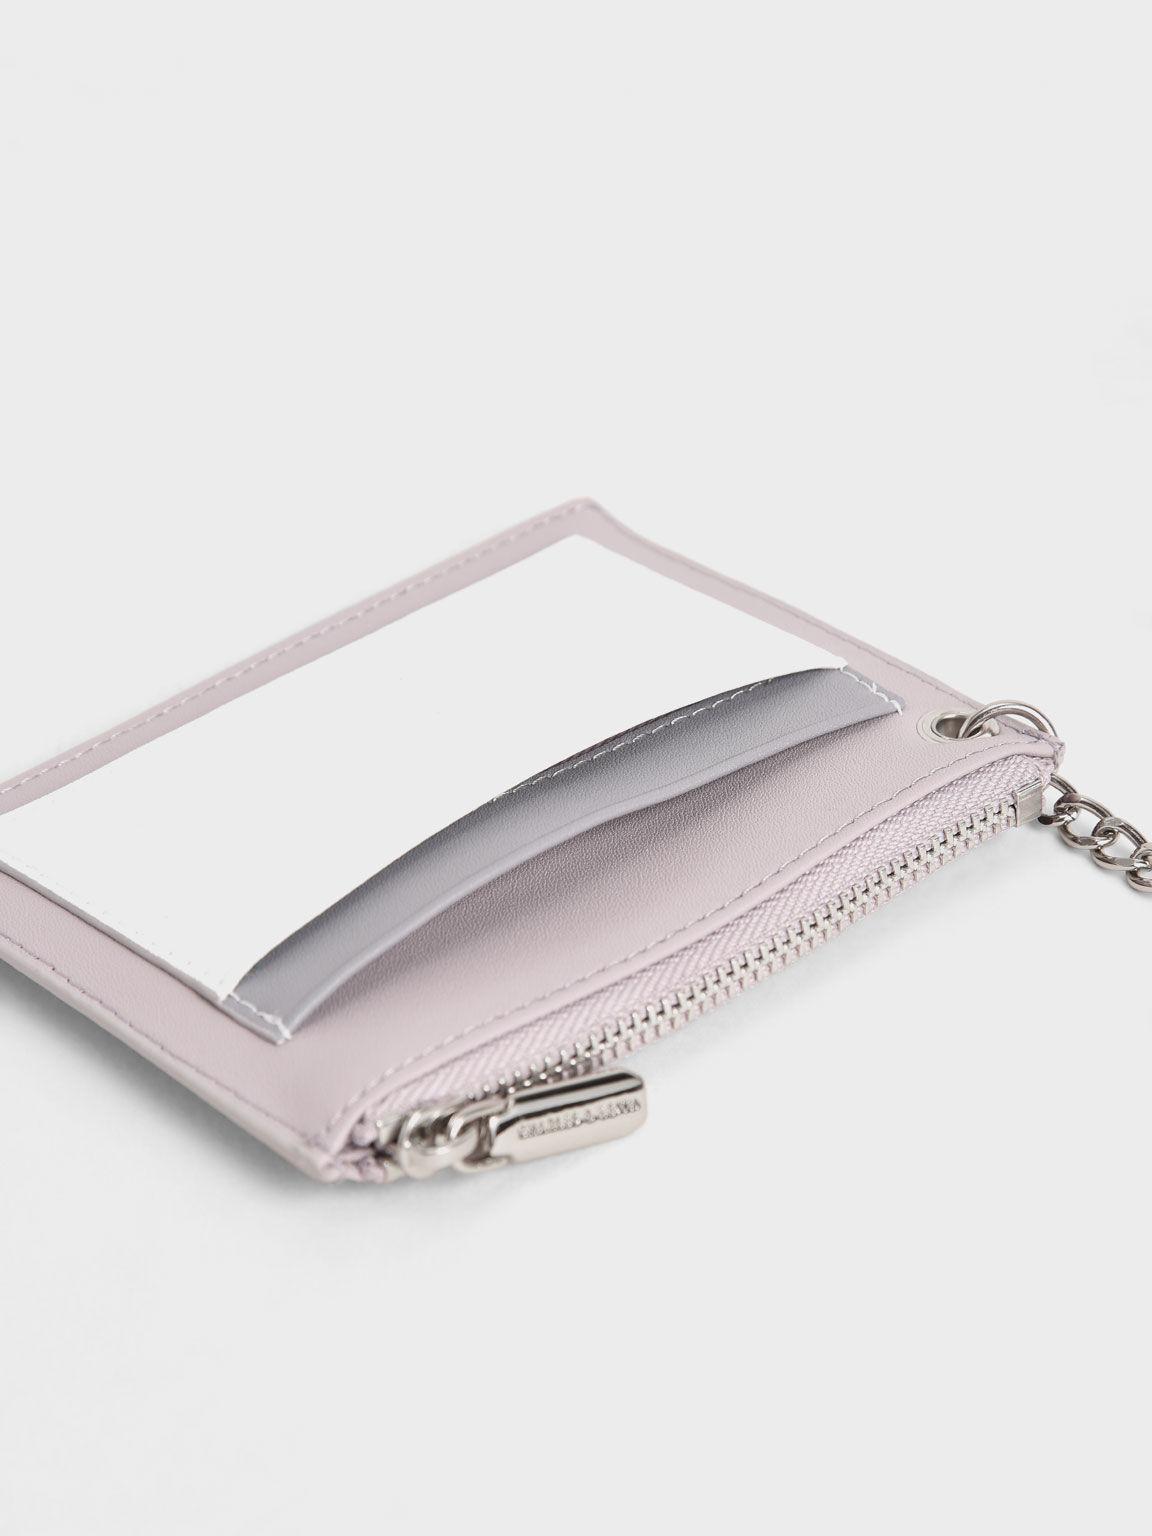 Ring Detail Card Holder, Lilac, hi-res